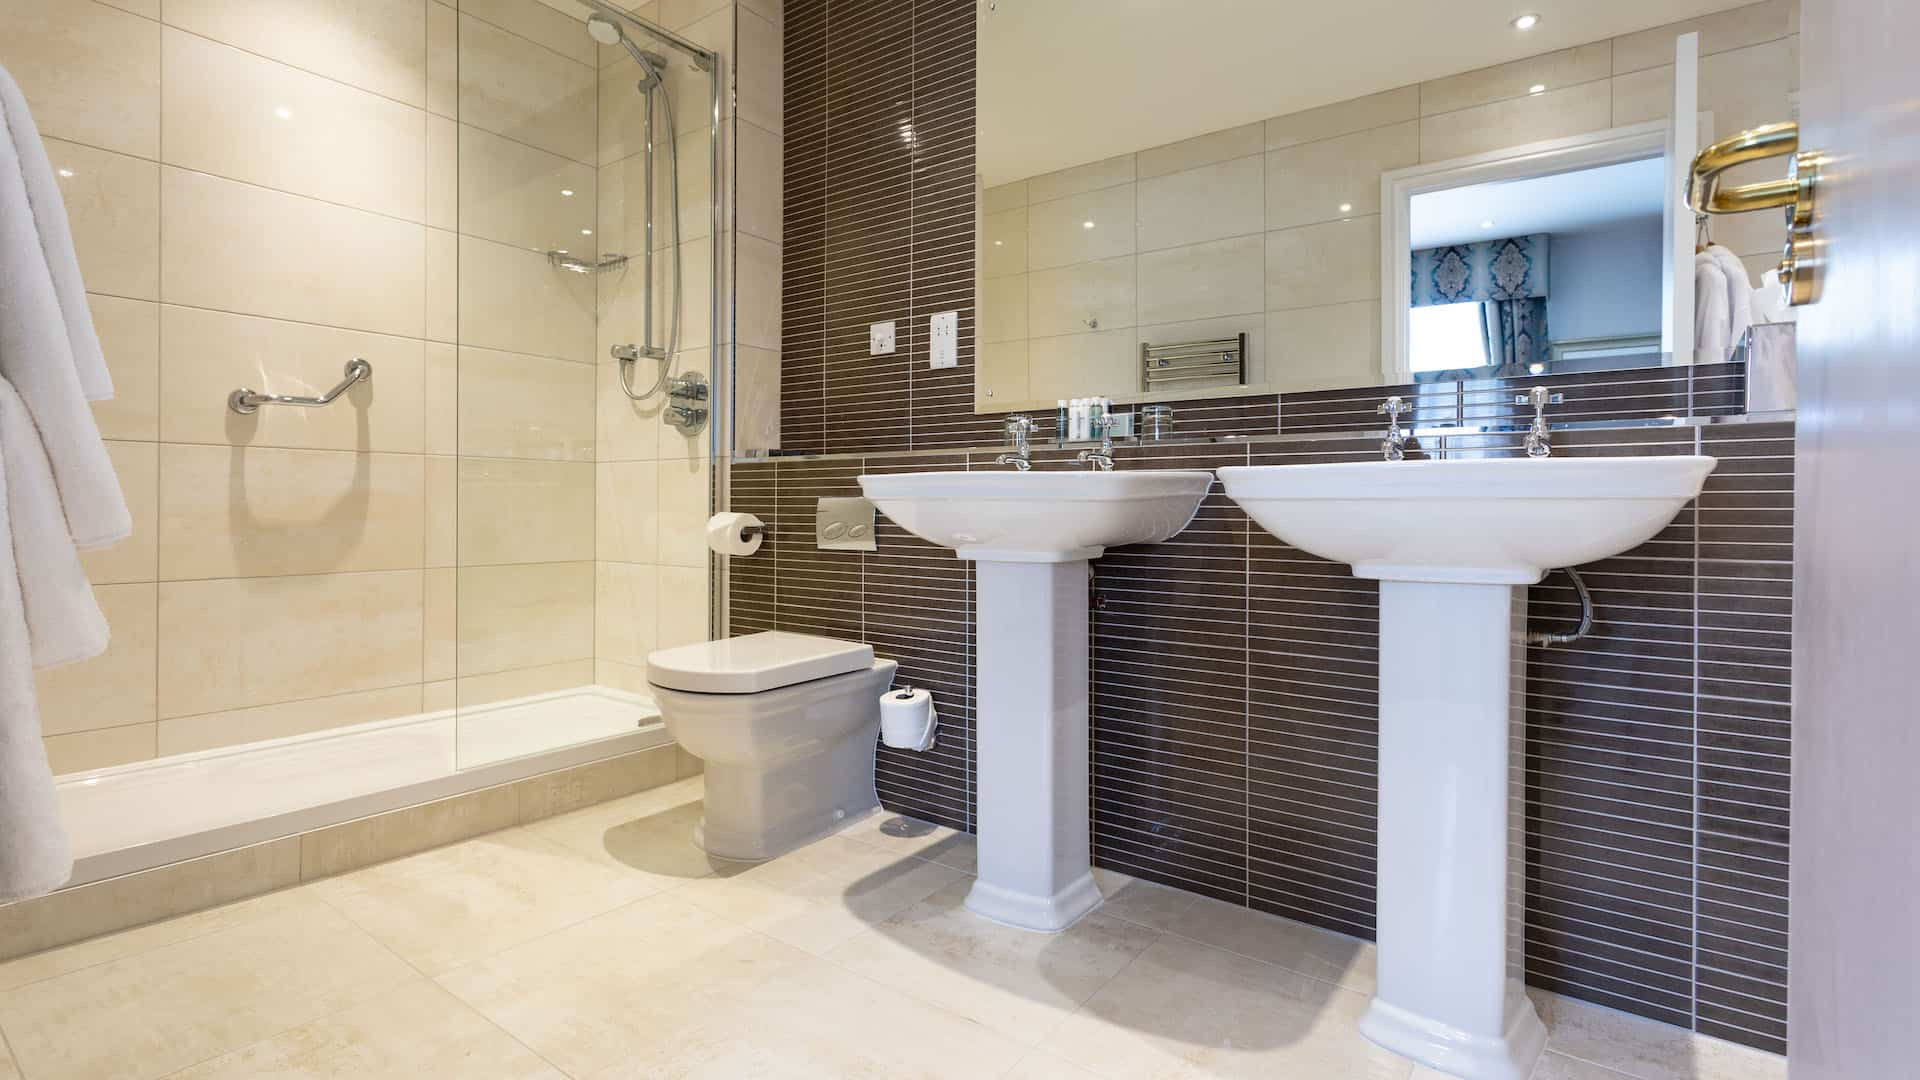 Swans-Nest-Shakespeare-Suite-Bathroom-16_1920x1080